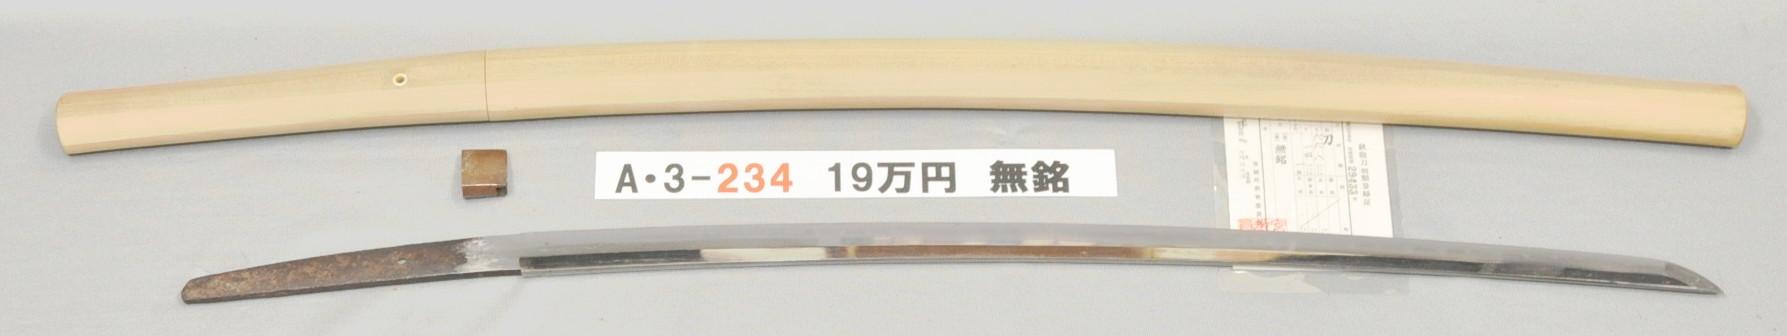 A3234